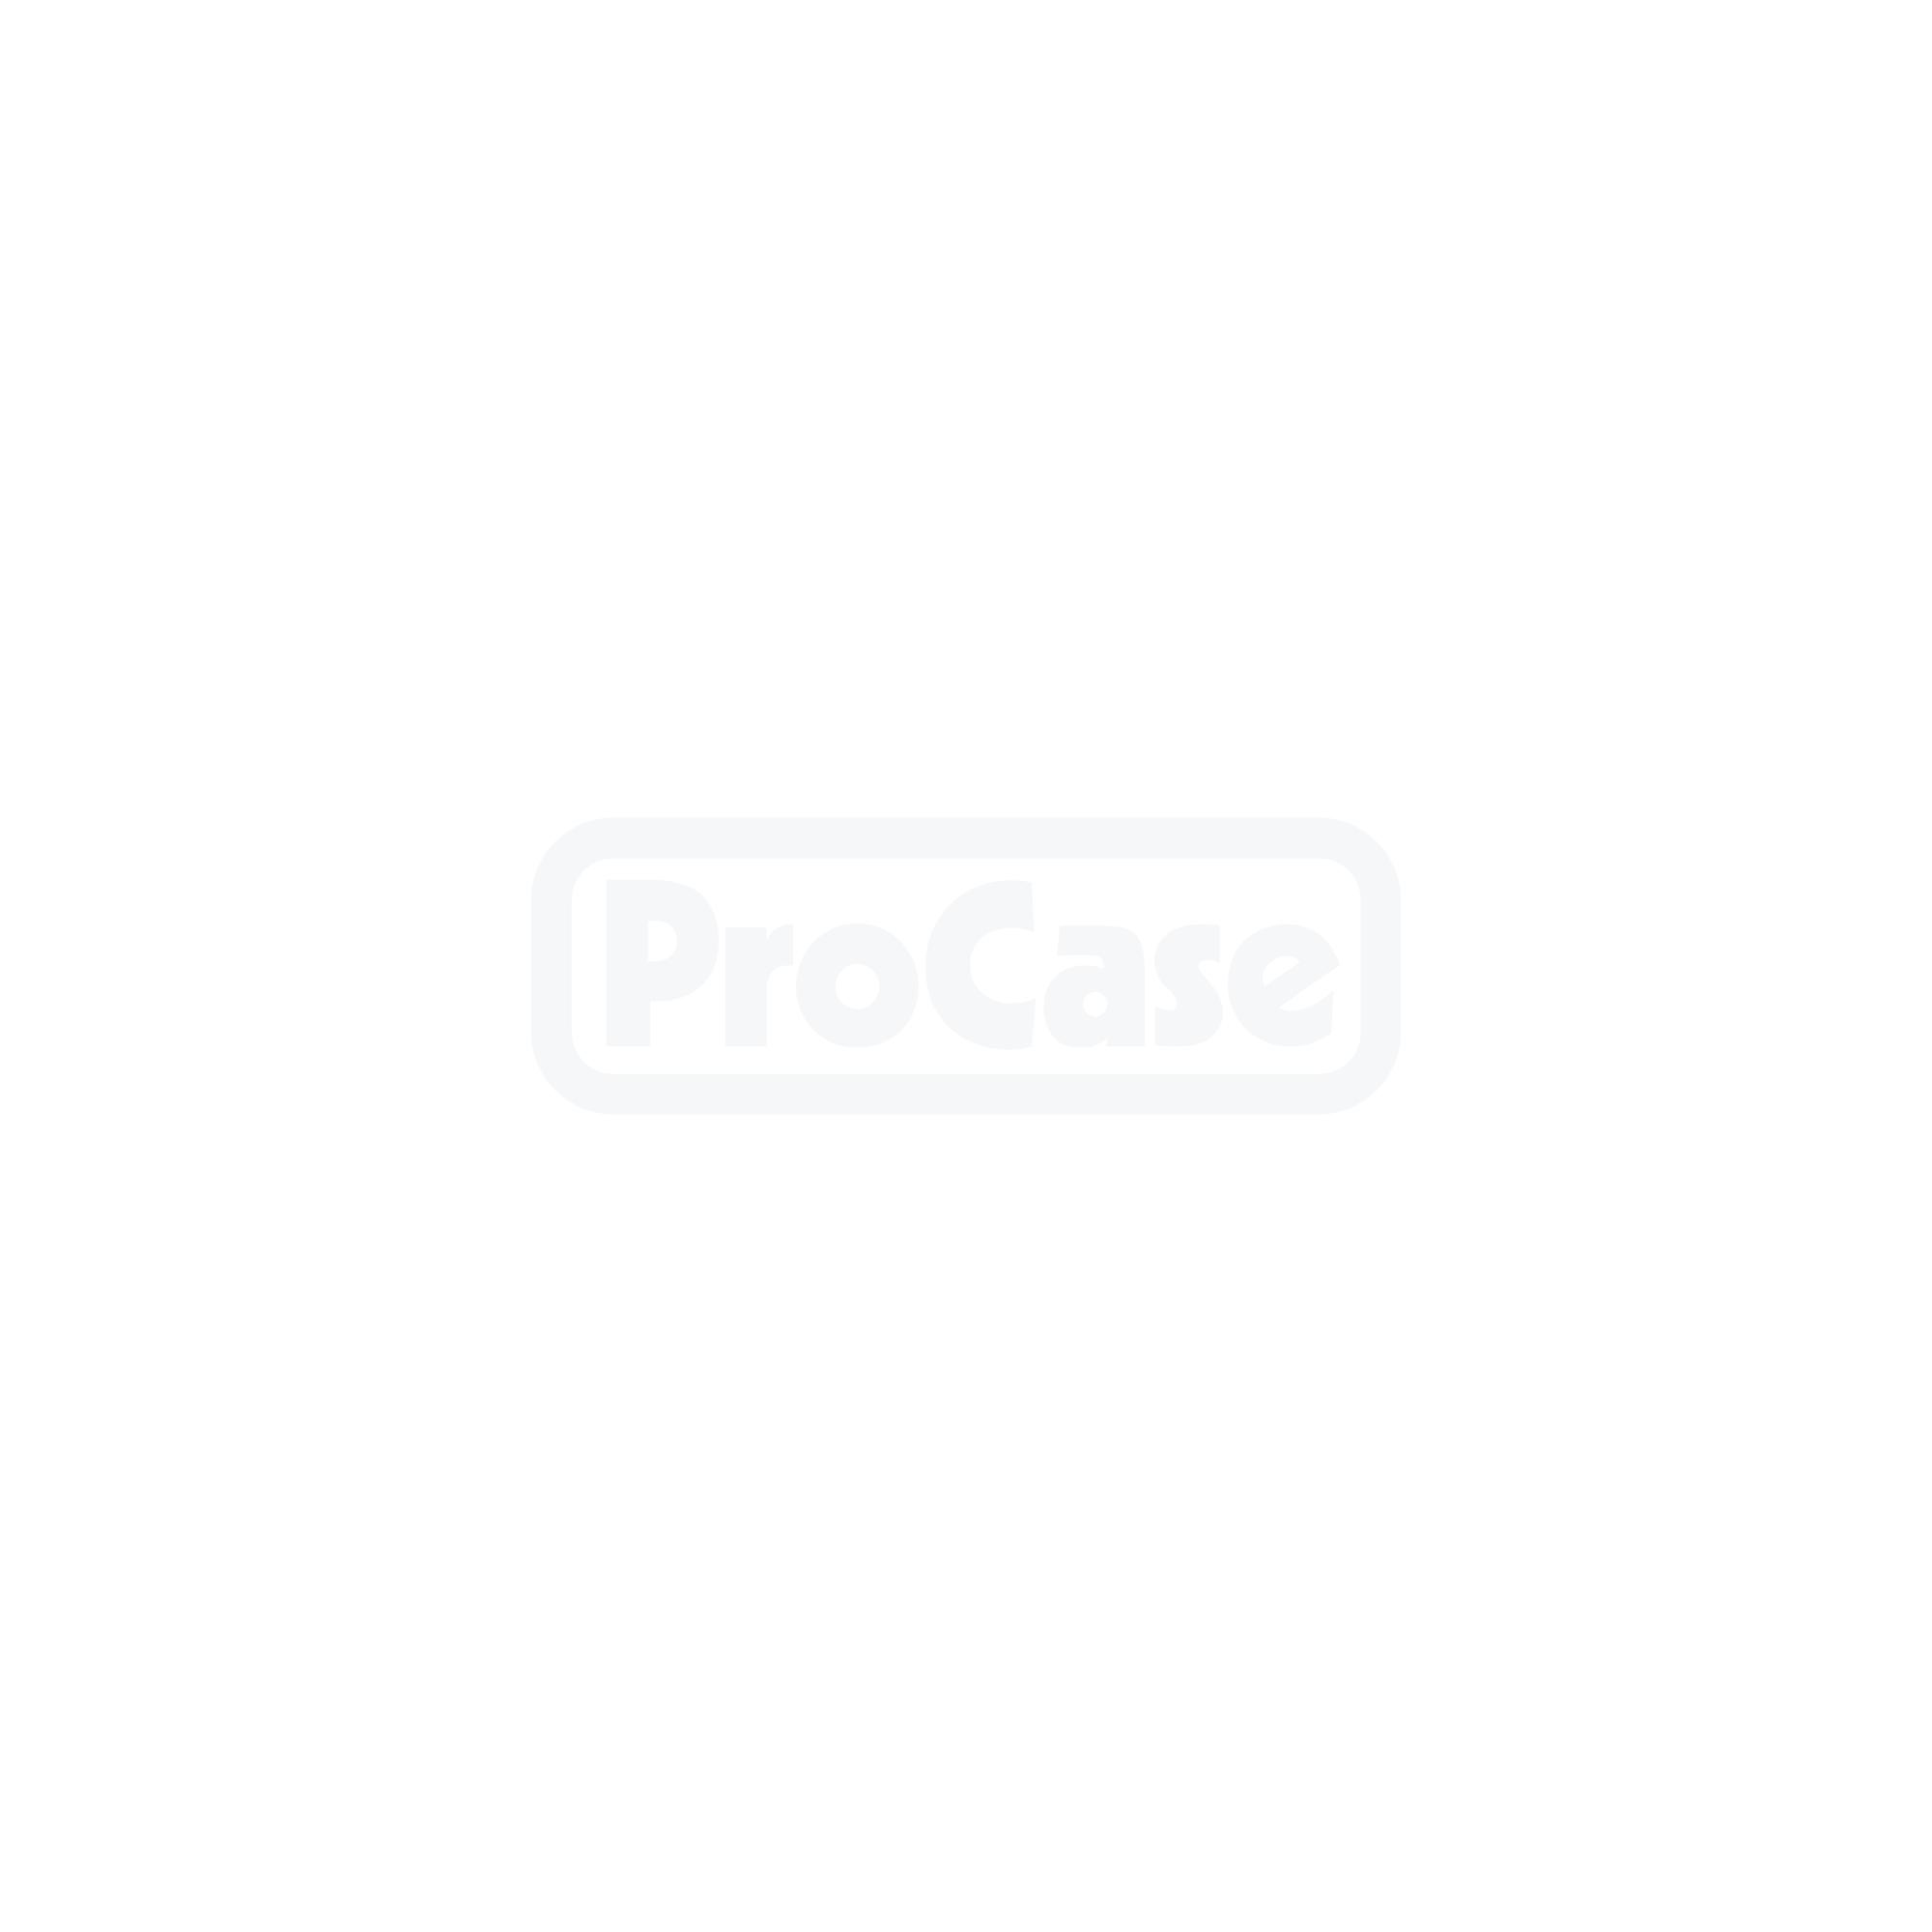 SKB 3i Koffer 2217-8B mit Rasterschaumstoff